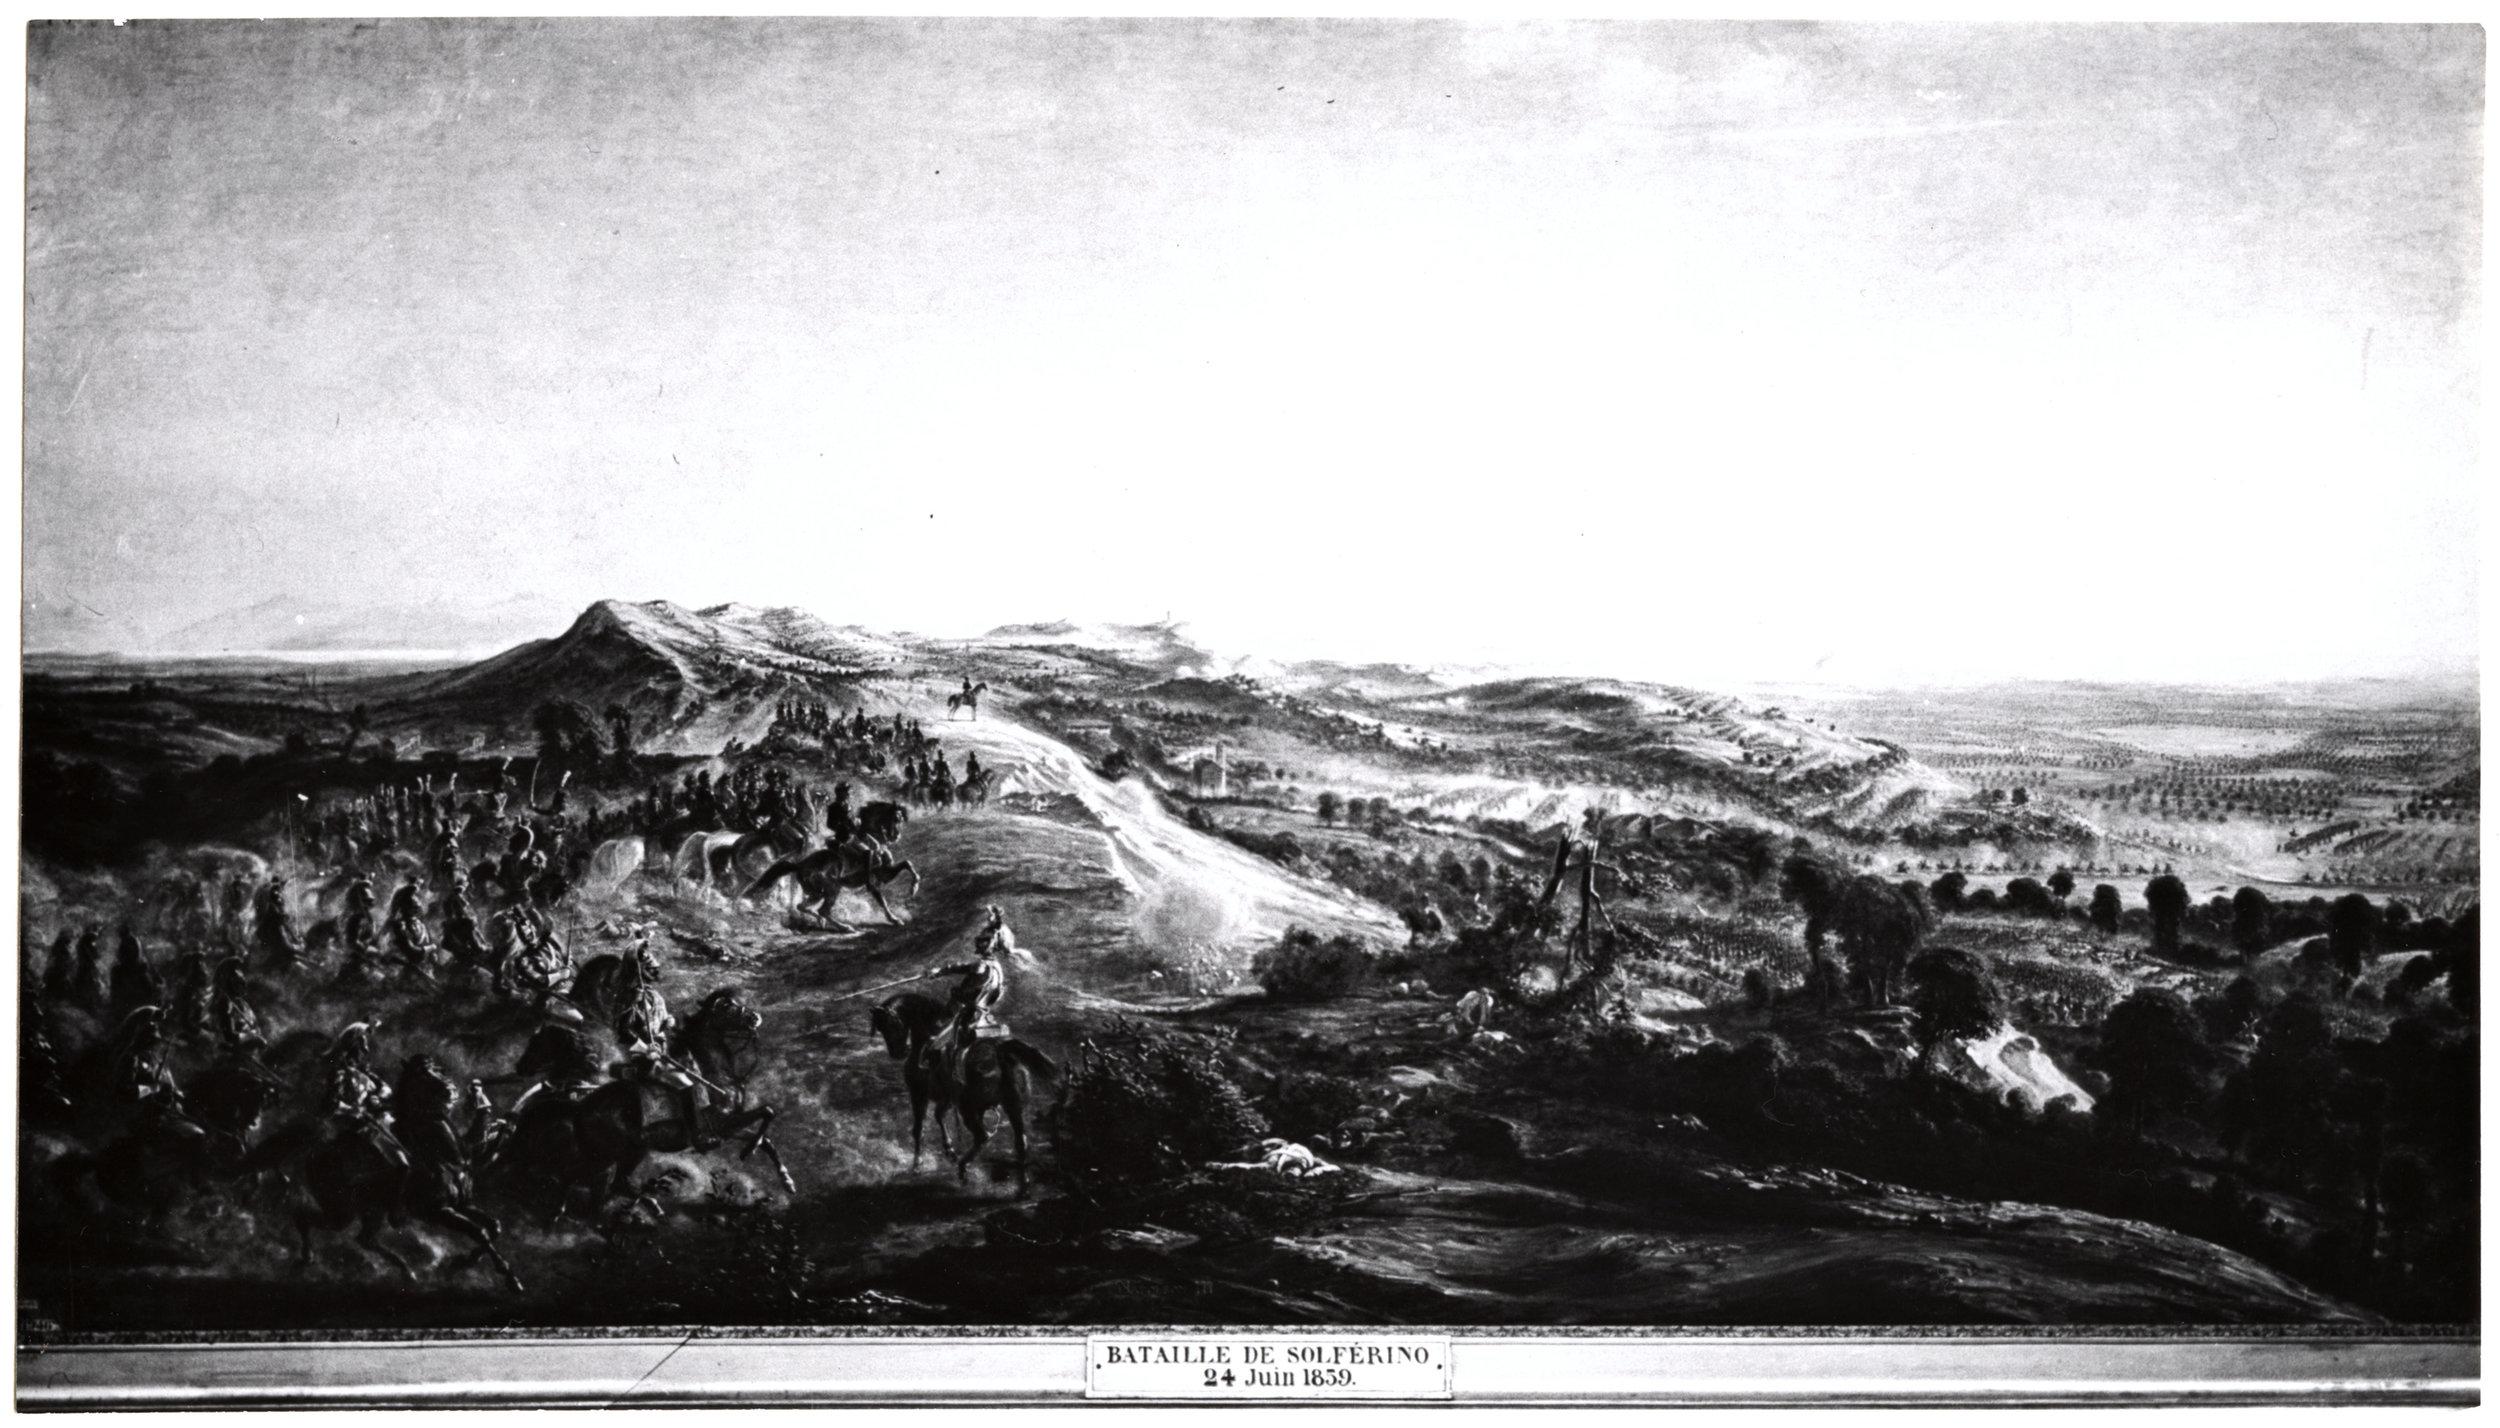 The battlefield on June 24, 1859.